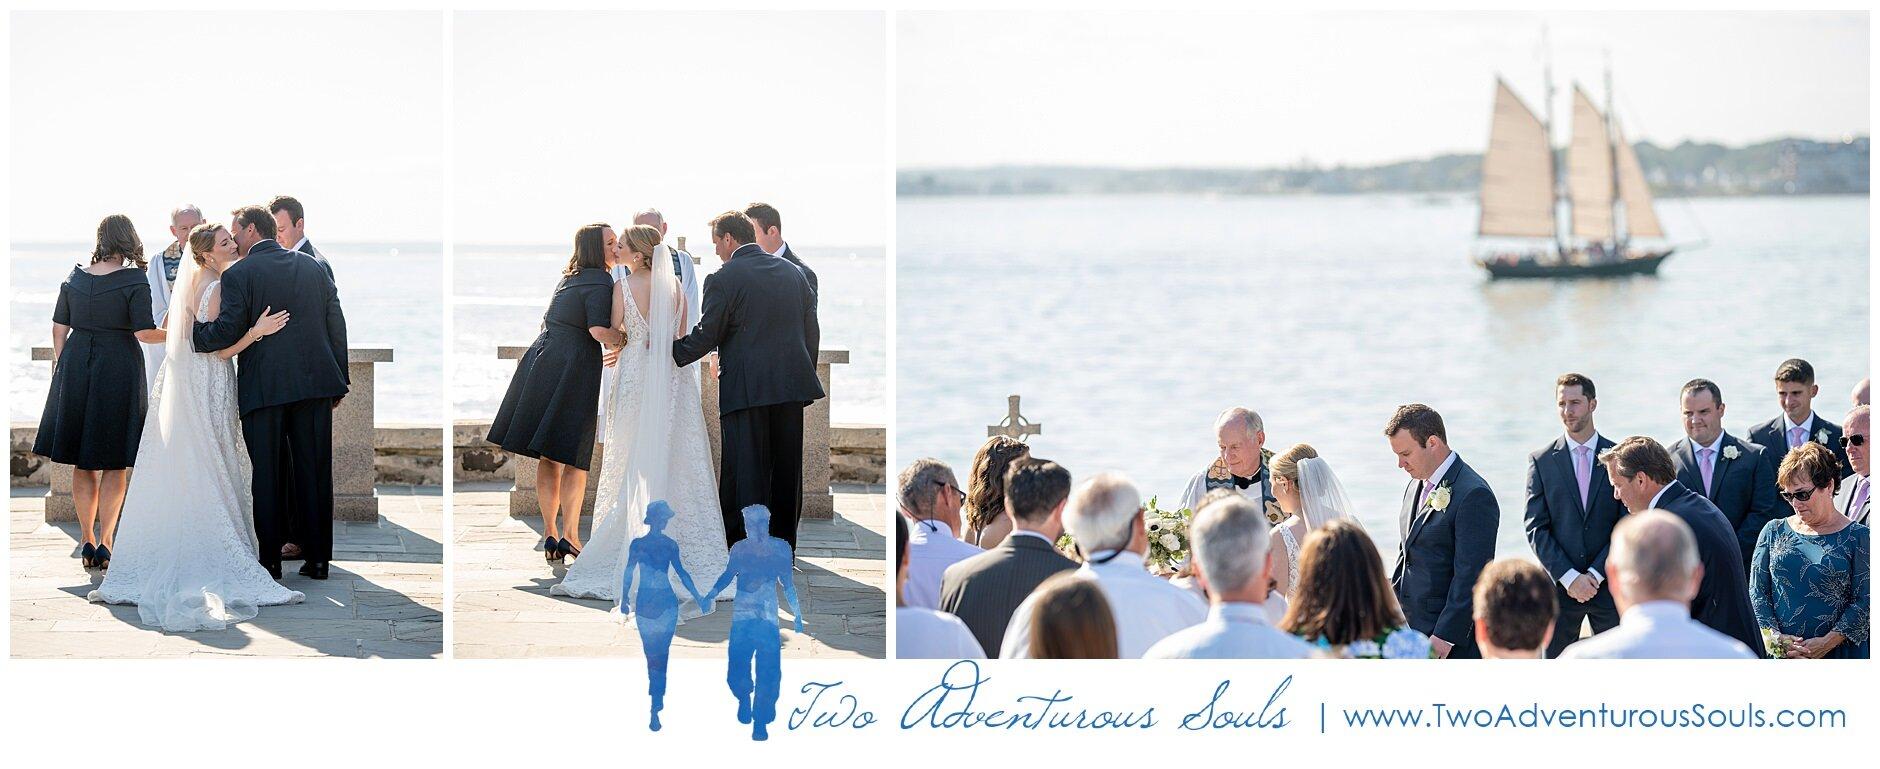 Breakwater Inn and Spa Wedding Photographers, Kennebunkport Wedding Photographers, Two Adventurous Souls- 092119_0030.jpg